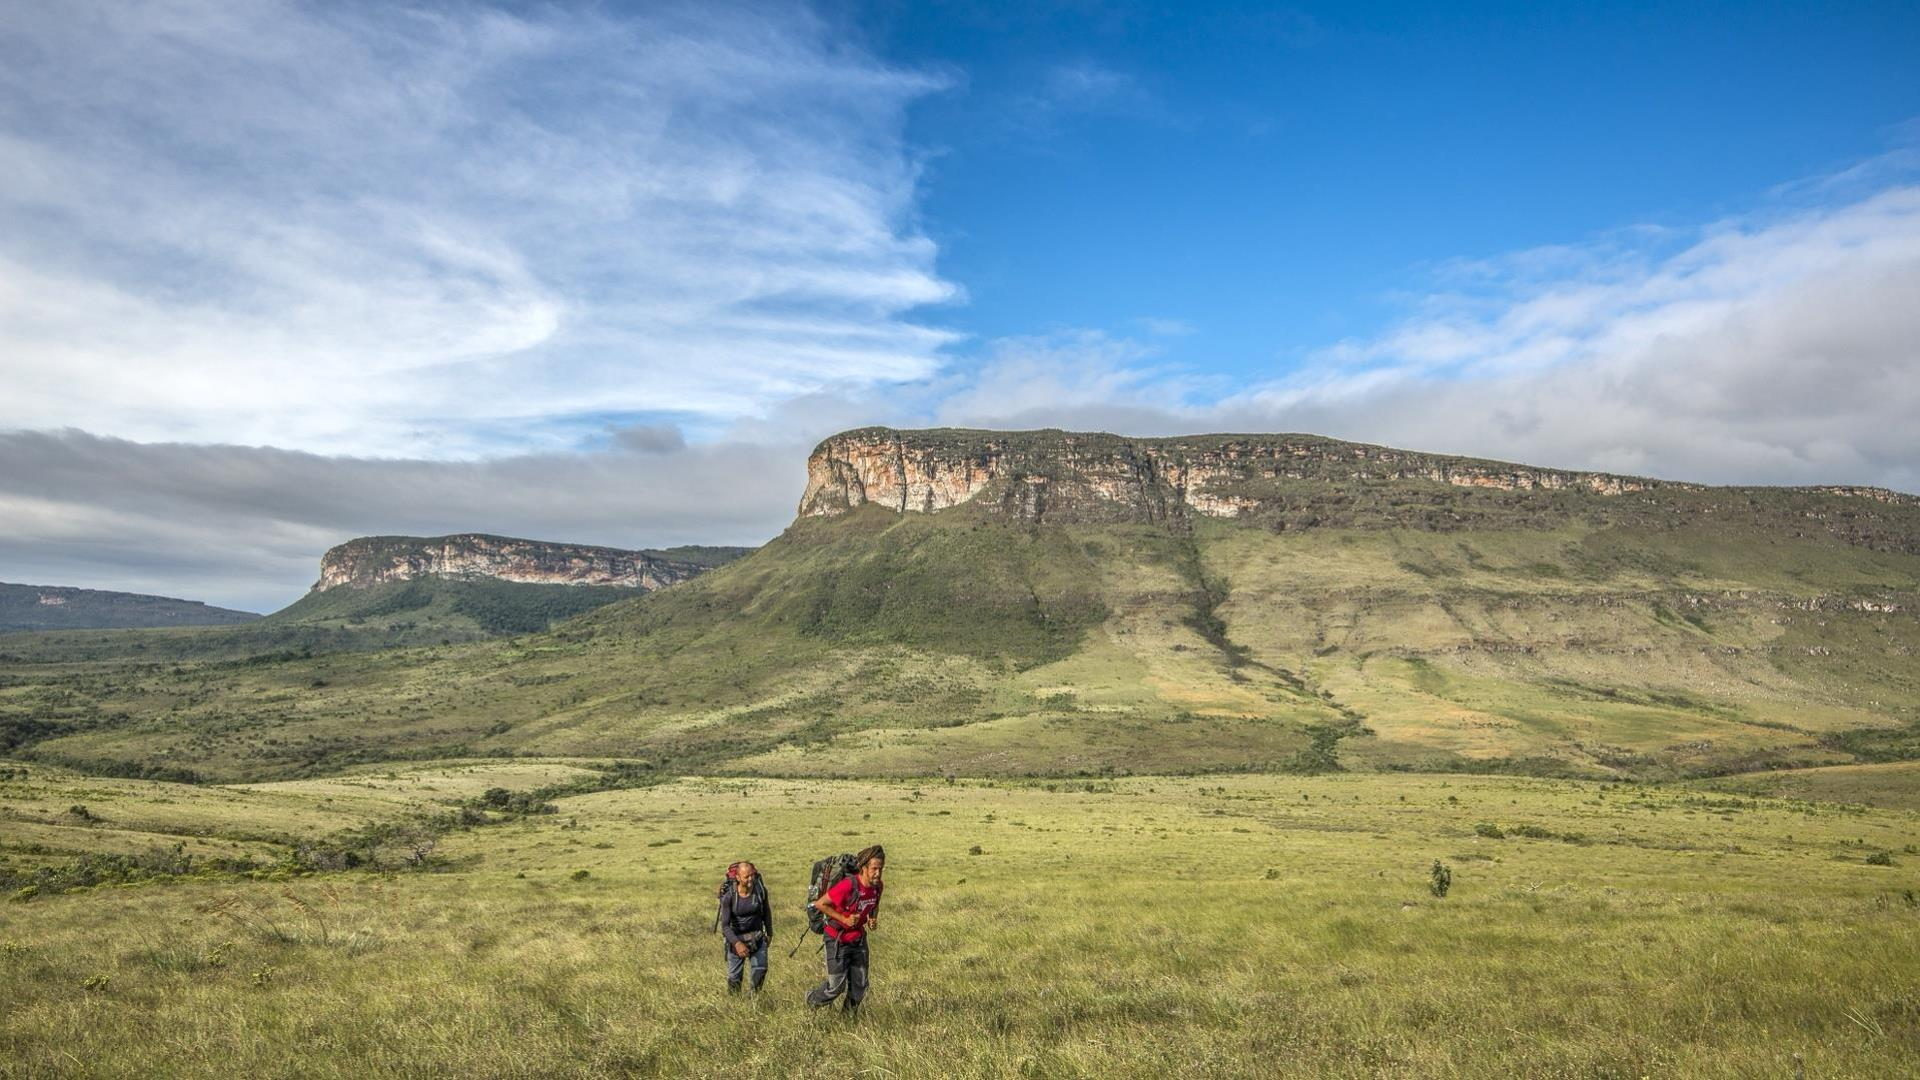 Two visitors trekking in the Chapada Diamantina National Park, Bahia - Brazil